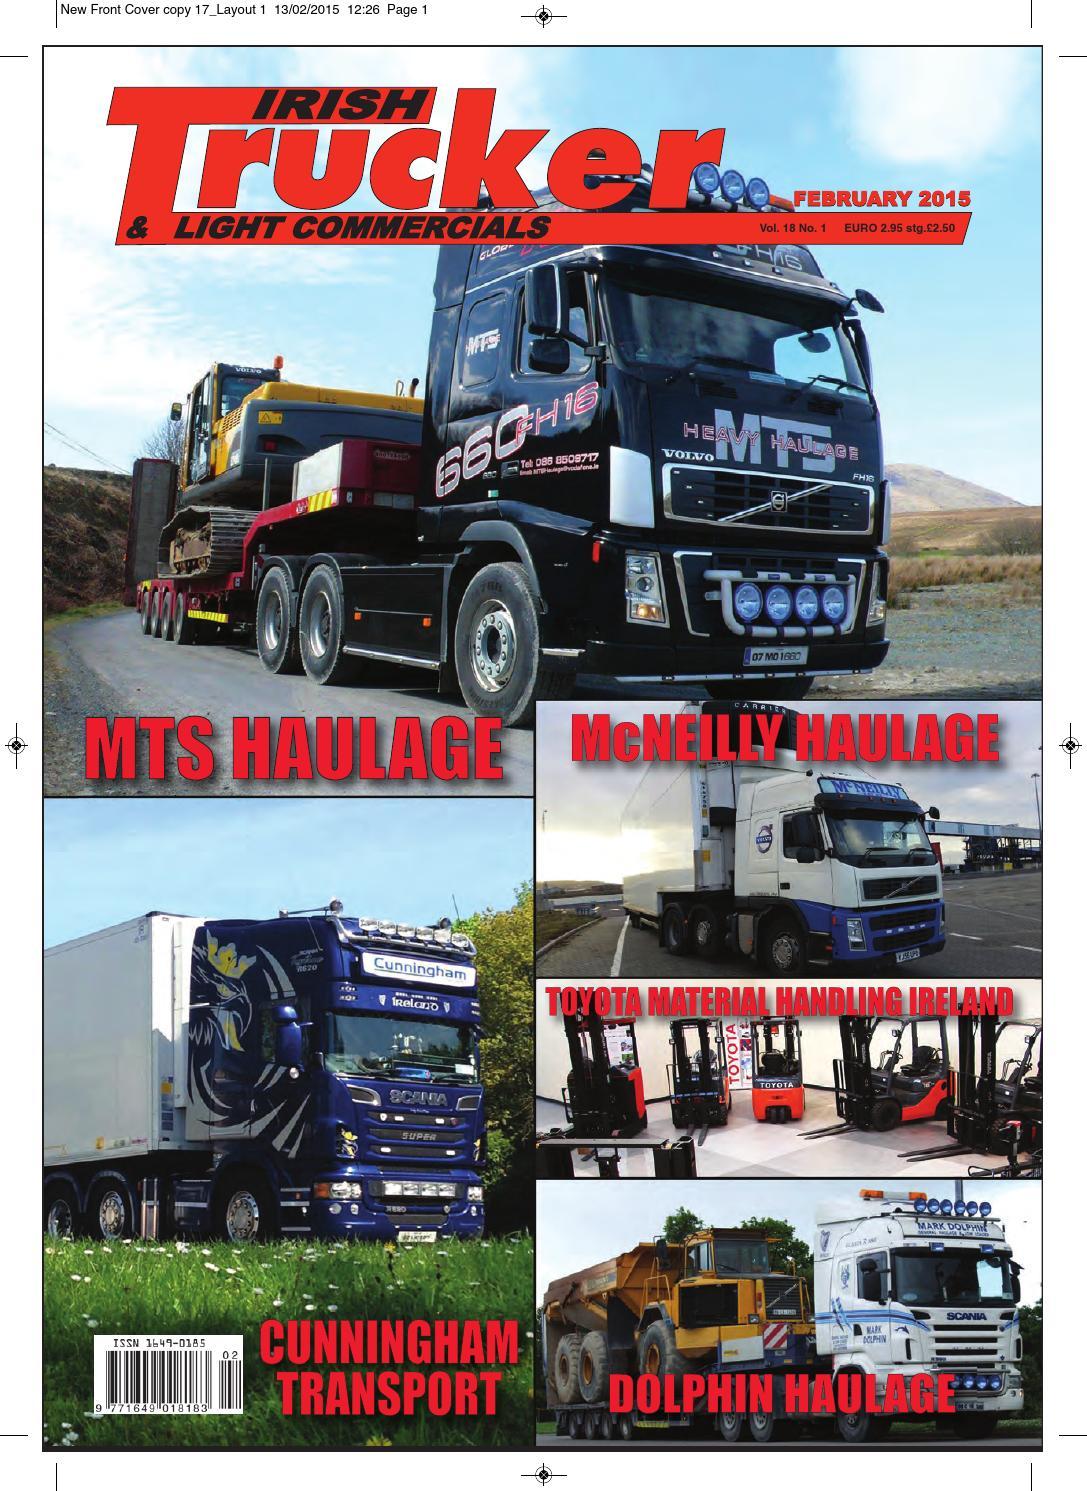 69ebe24f11 Irish Trucker   Light Commercials magazine February 2015 by Lynn Group  Media - issuu